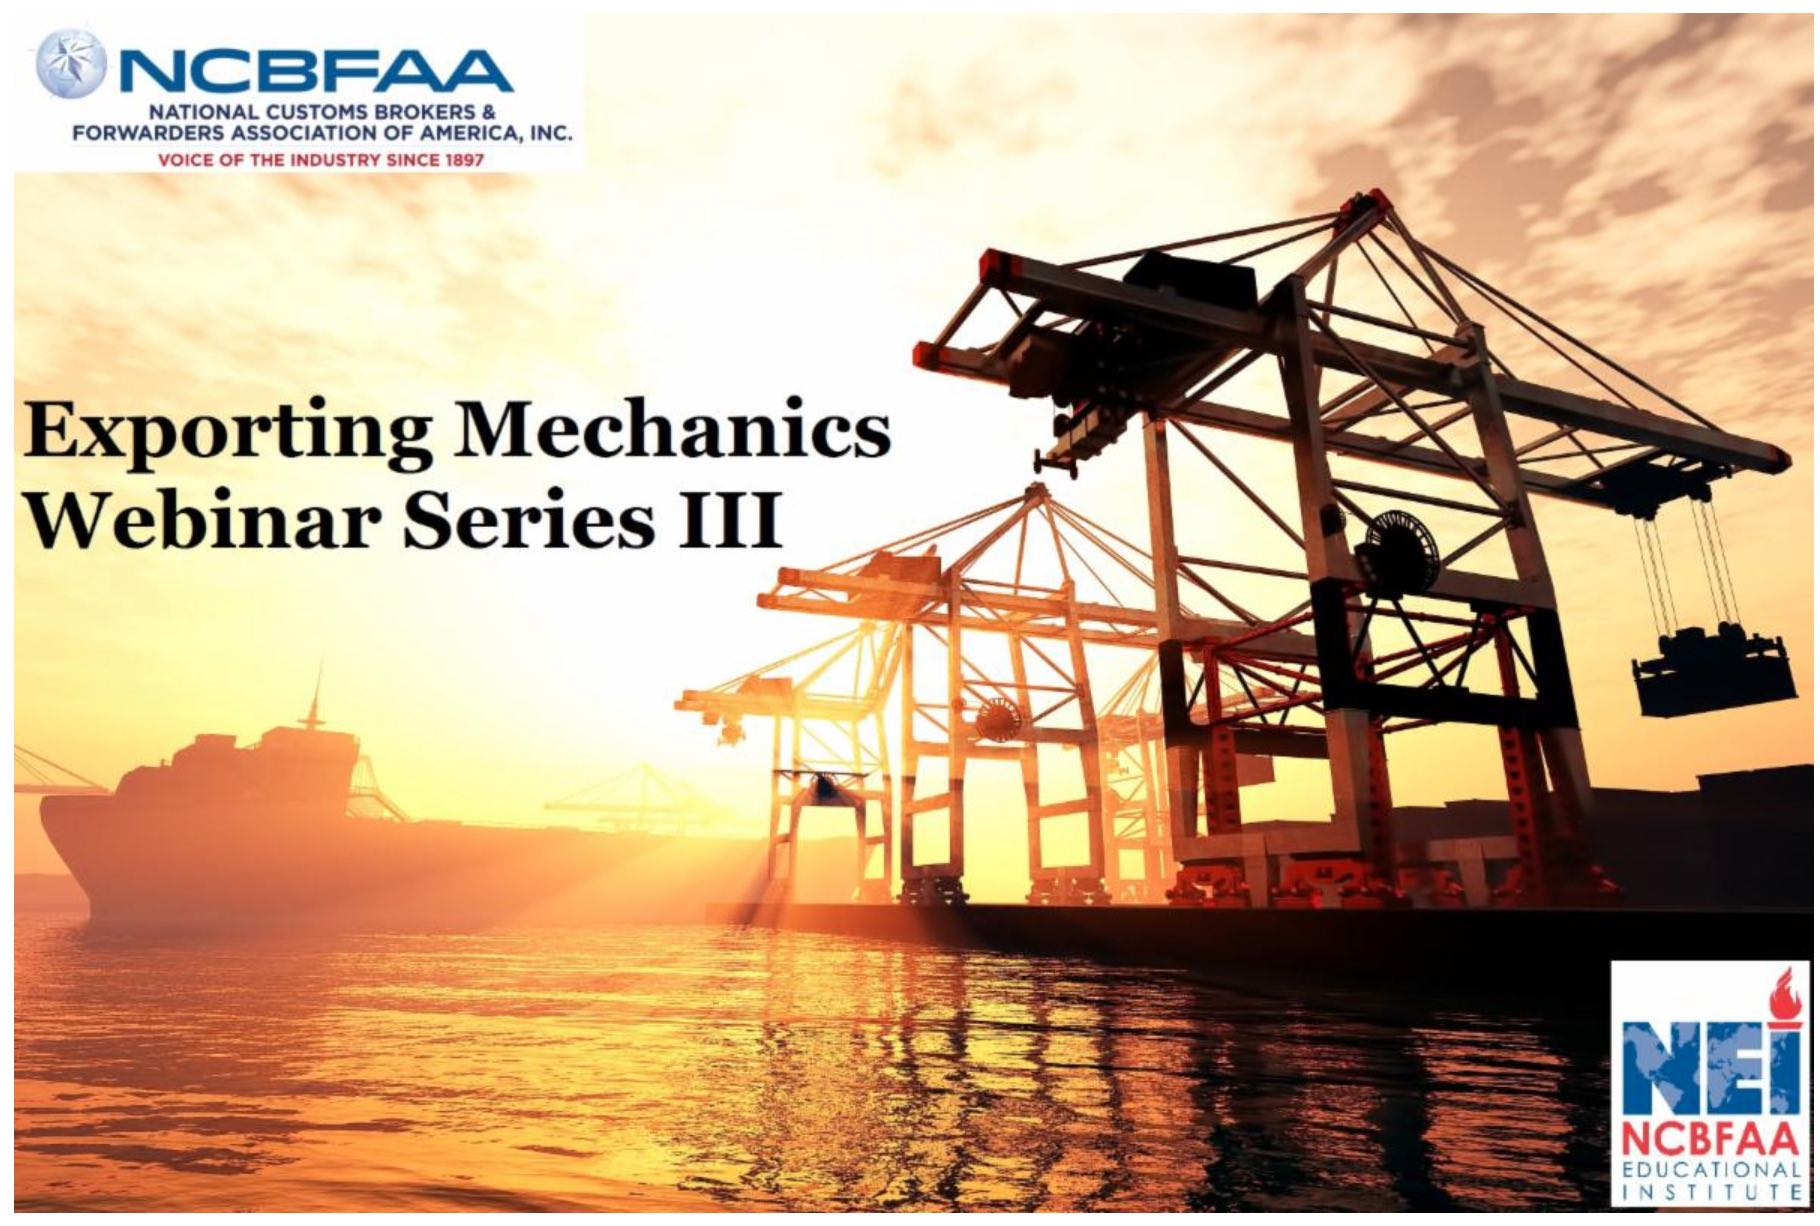 Exporting Mechanics Webinar Series III